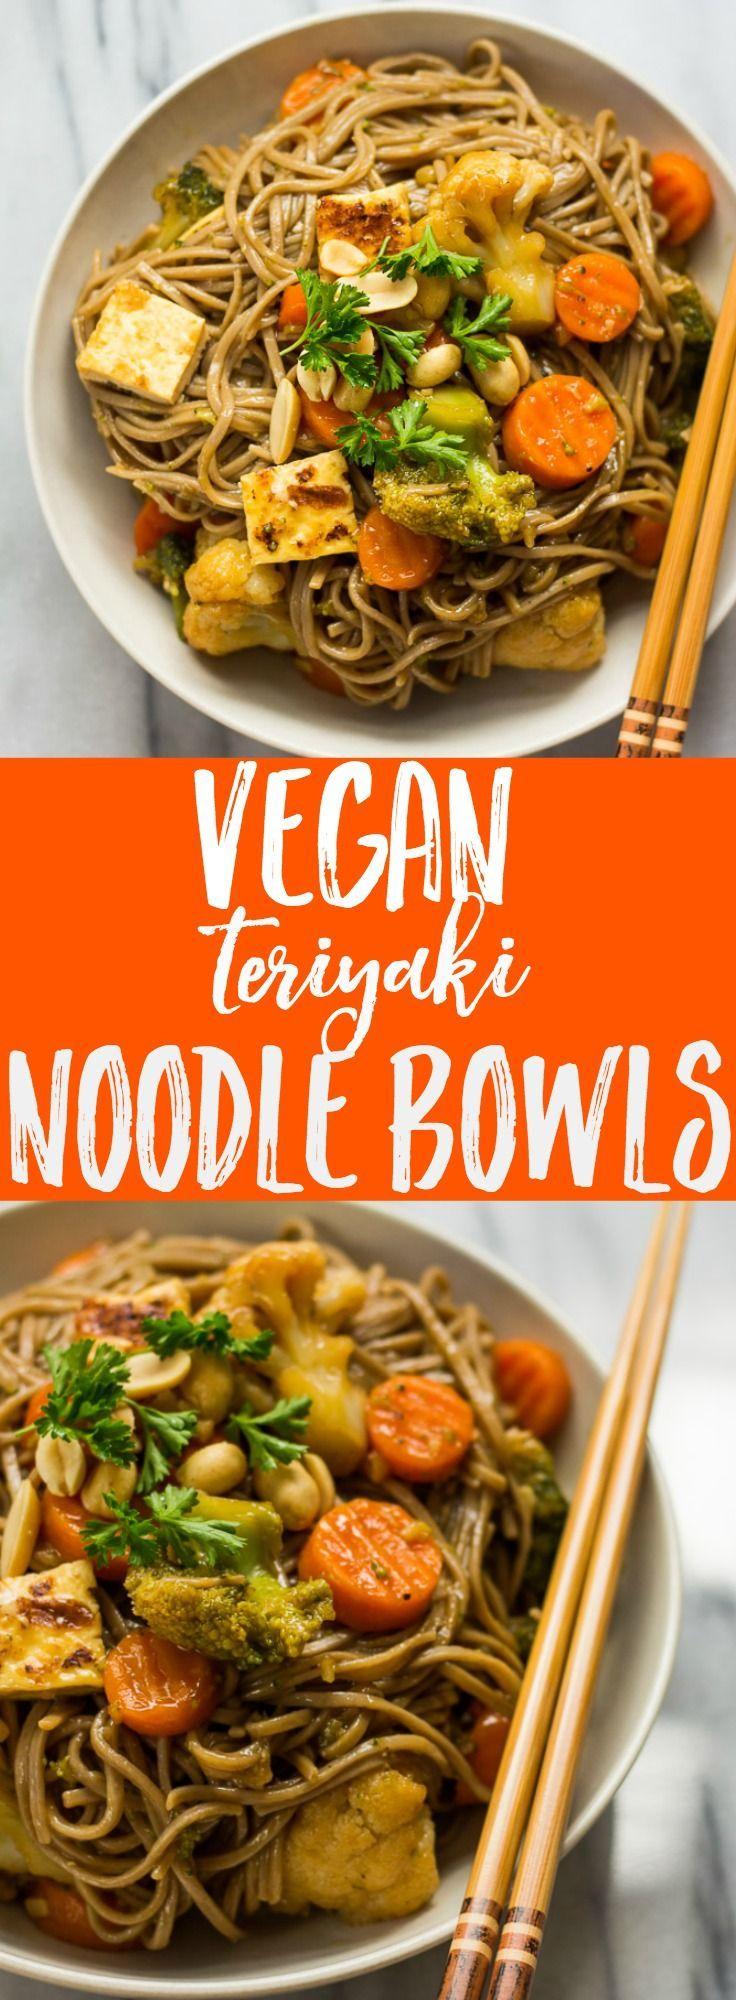 Vegan Teriyaki Noodle Bowls Tofu Seasoned With Garlic Ginger And Soy Sauce With Buckwheat Soba Noodles Teriyaki Noodles Vegan Noodles Recipes Vegan Noodles